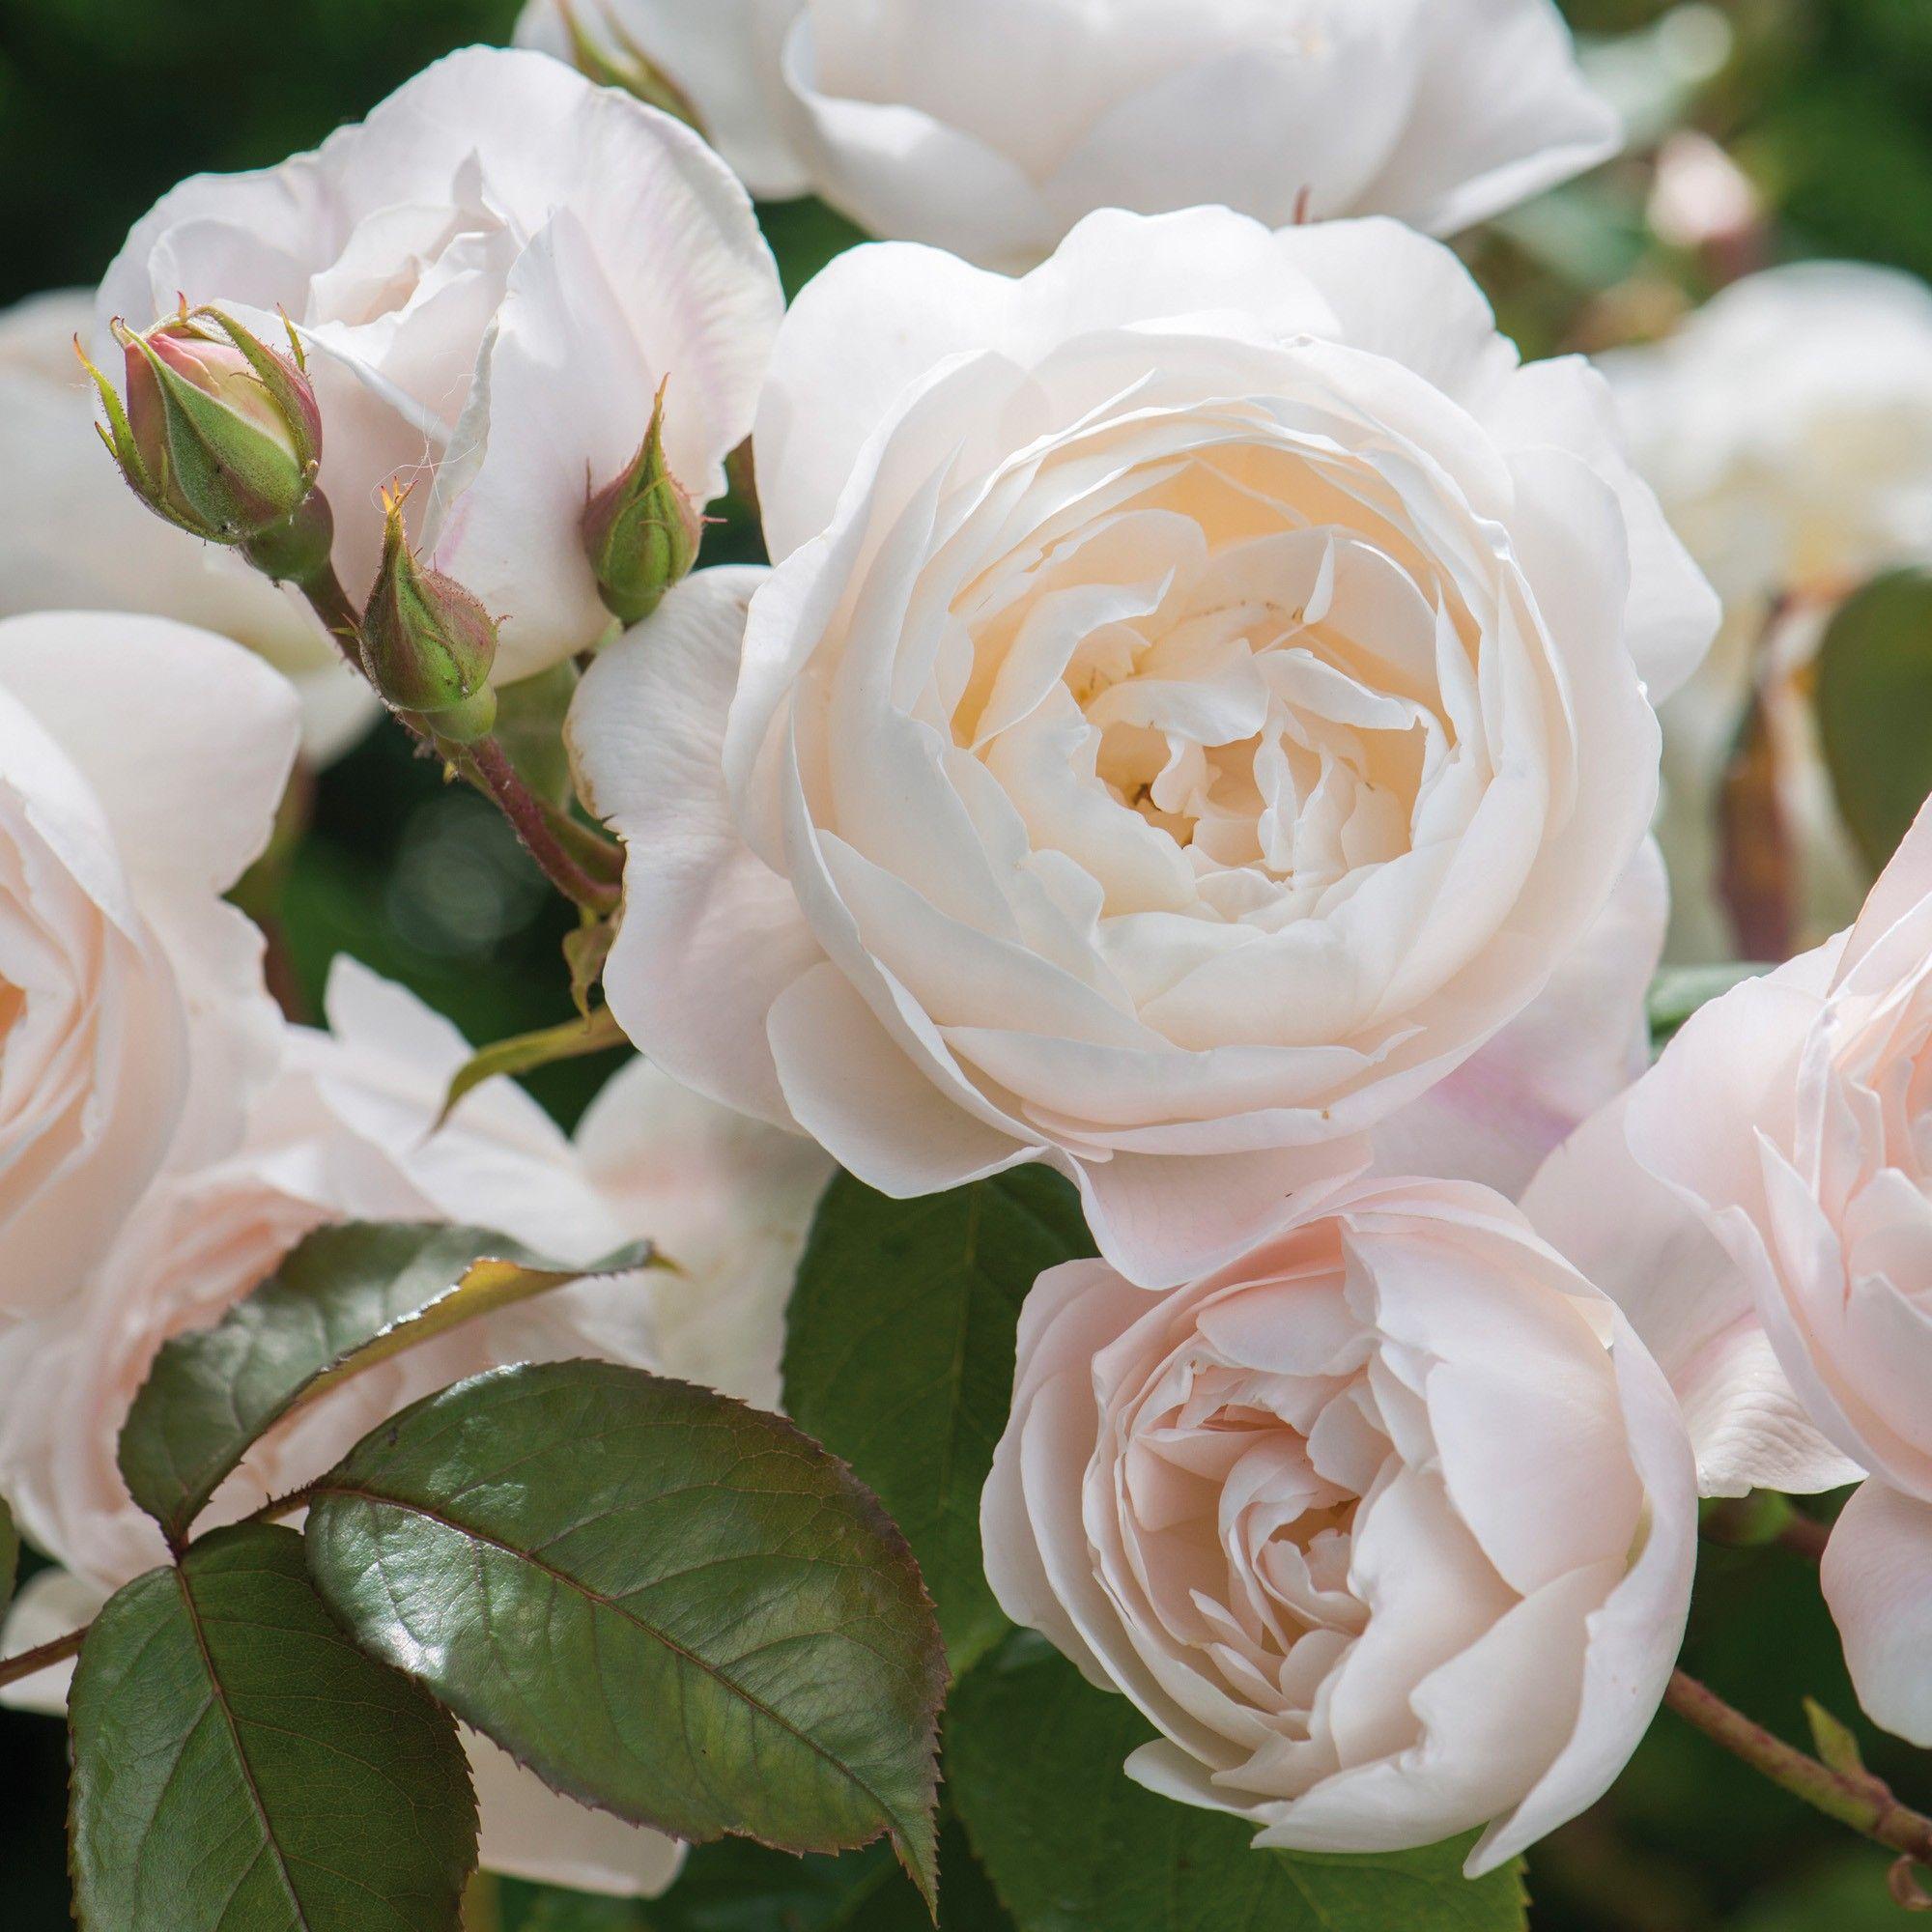 Desdemona..English Rose bred by David Austin